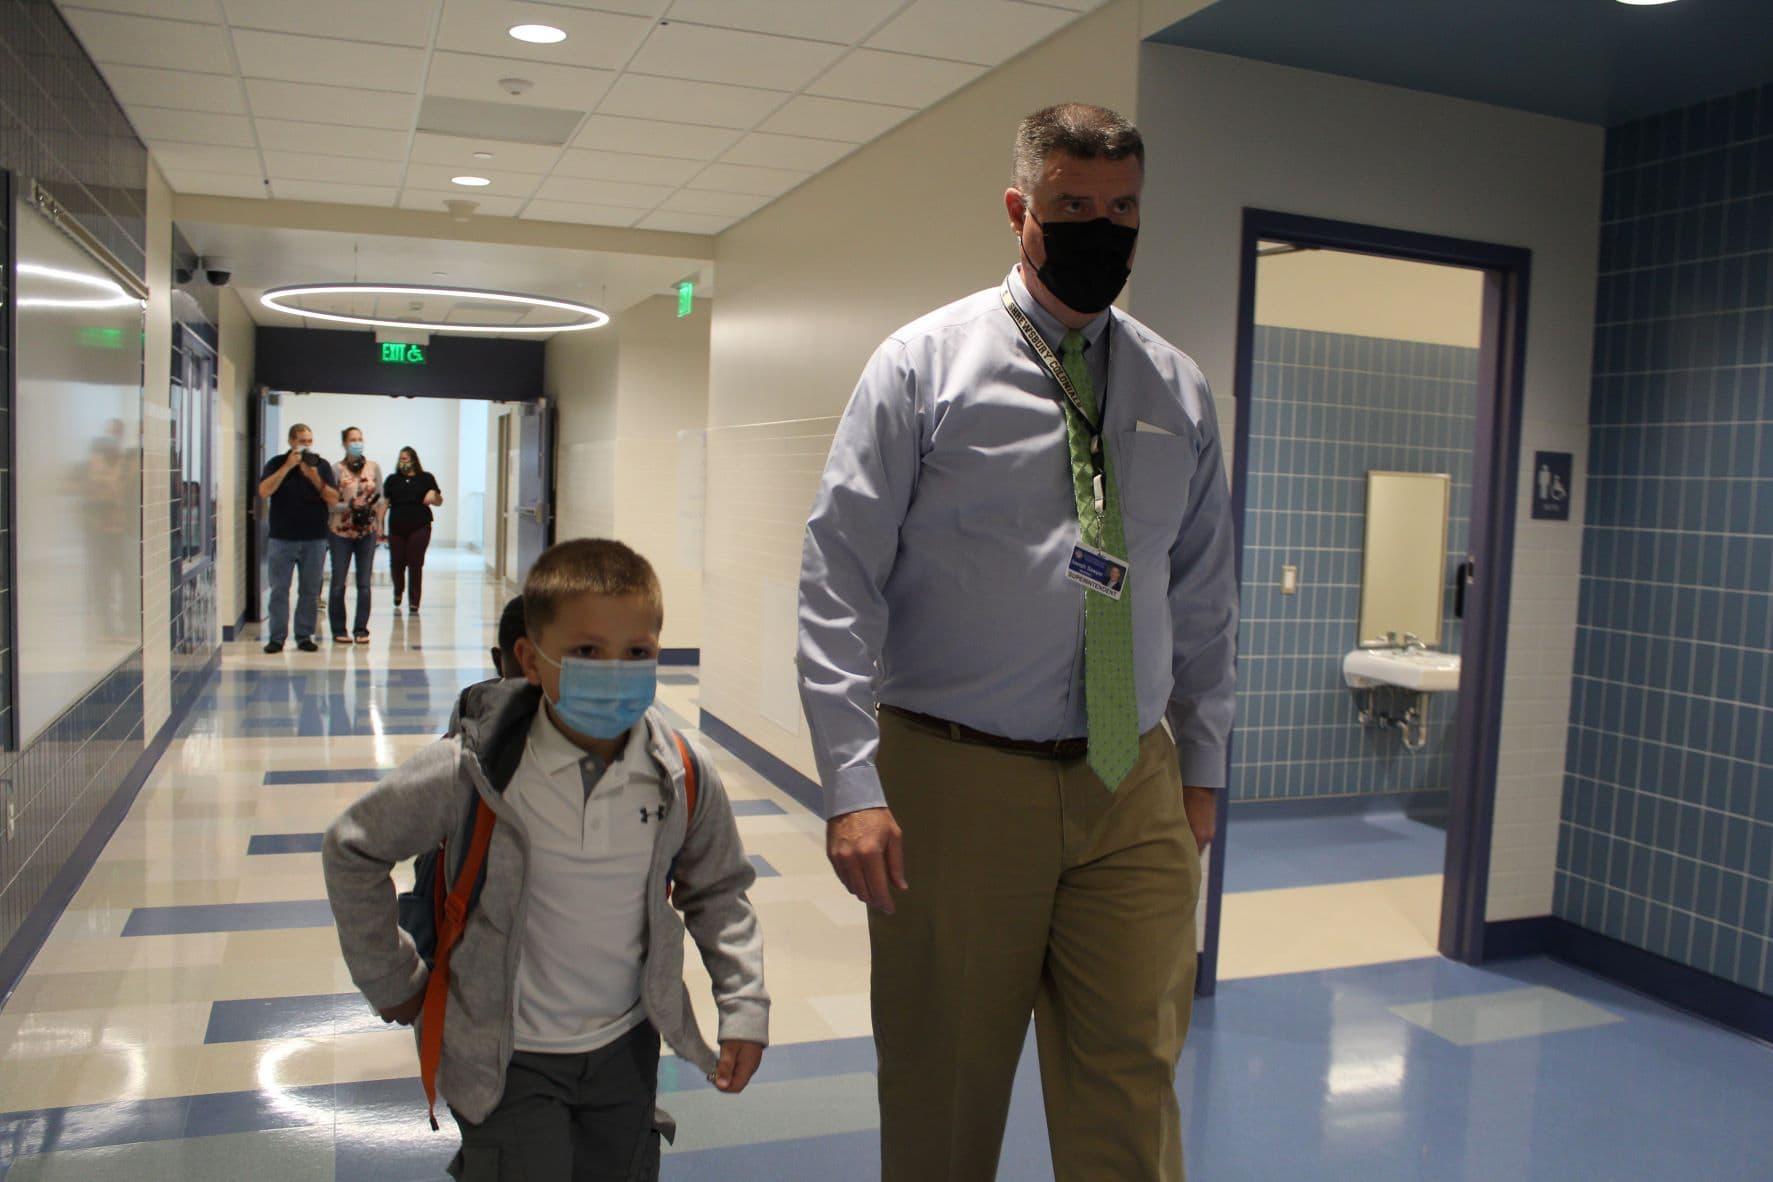 Superintendent Joseph Sawyer walks students to their new classroom.